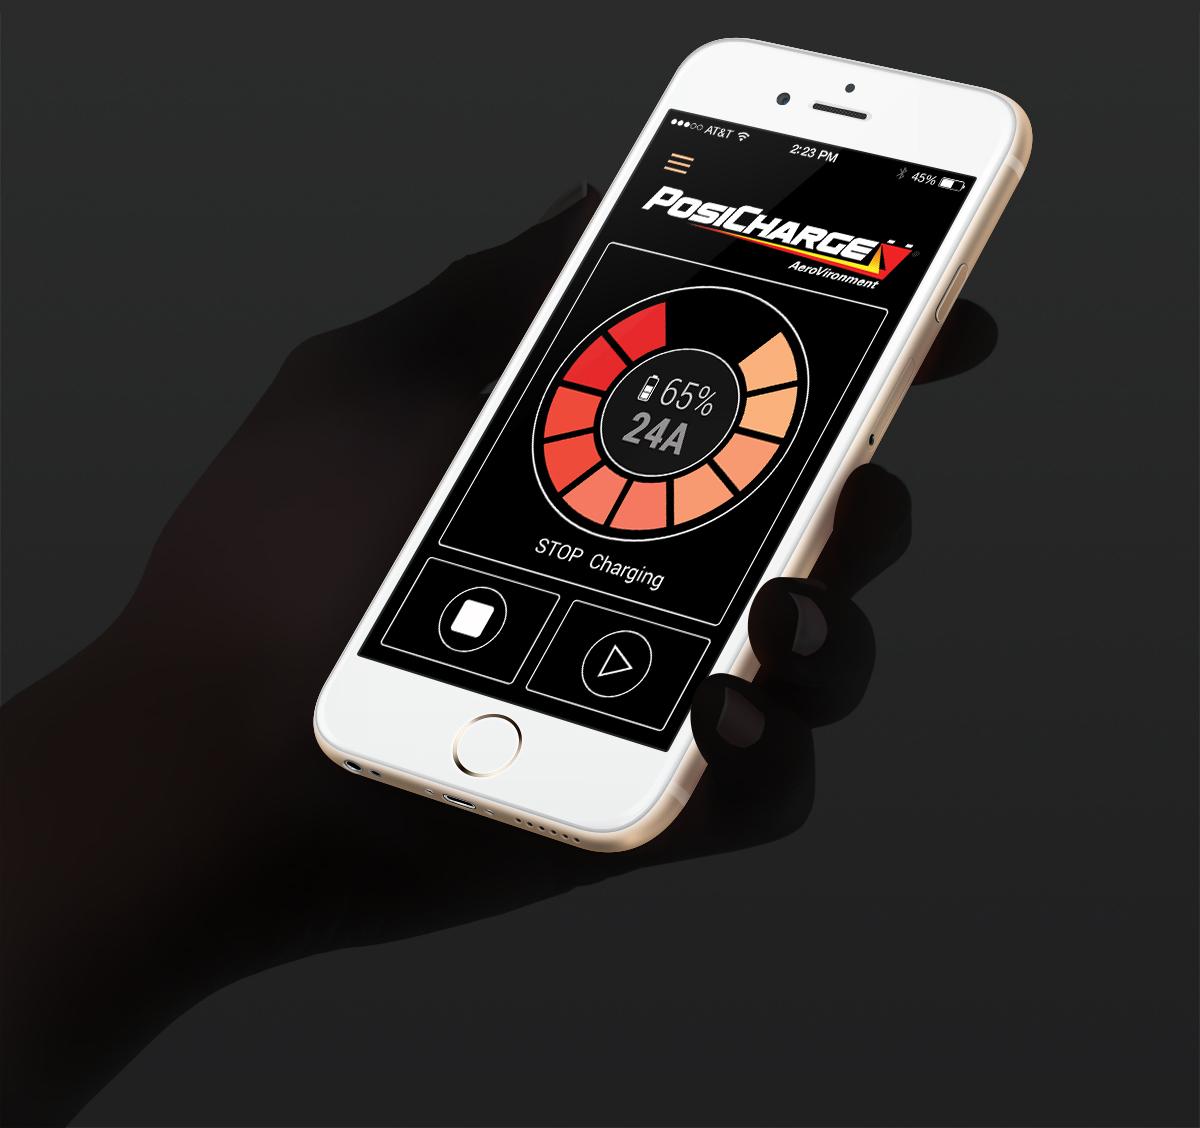 ProCore-Mobile-app-user-interface-design4.jpg